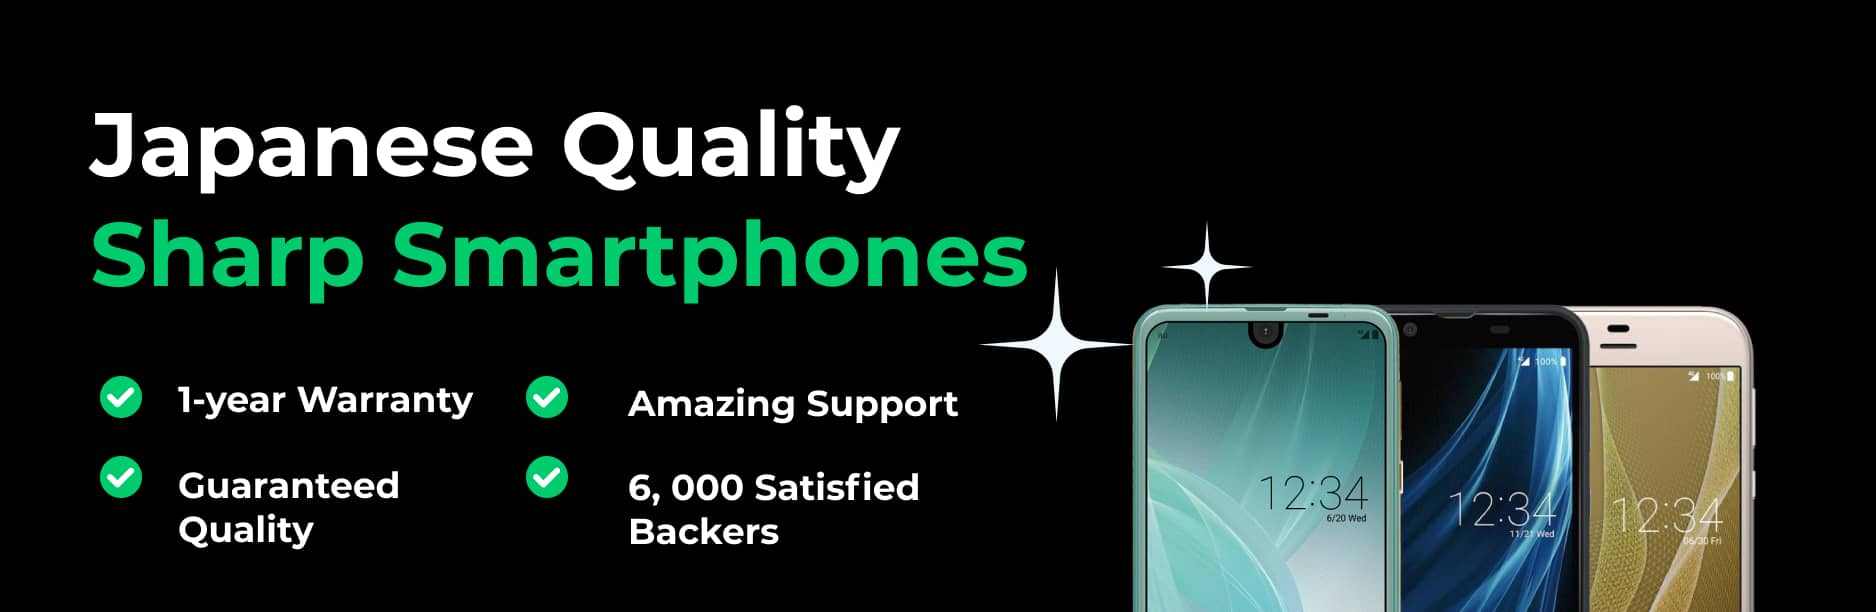 Japanese Quality Sharp Smartphones